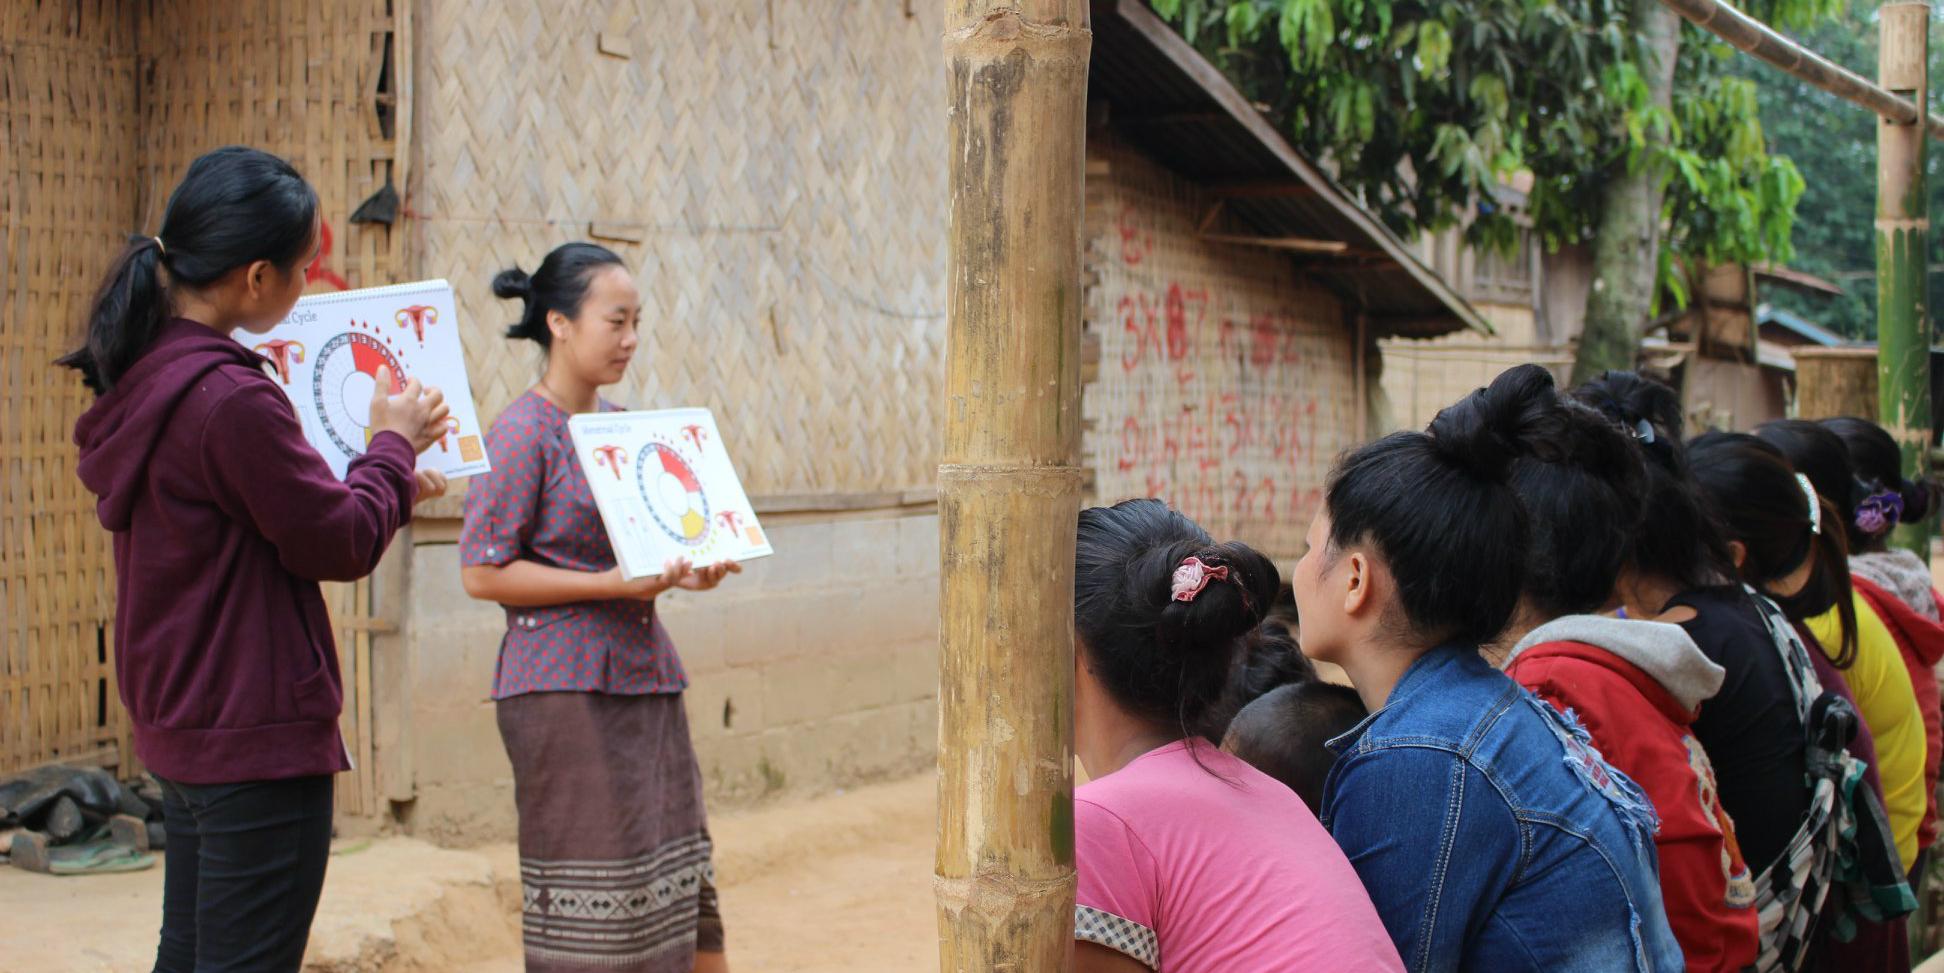 GVI community liasons lead a menstrual health workshop associated with a women's empowerment program.